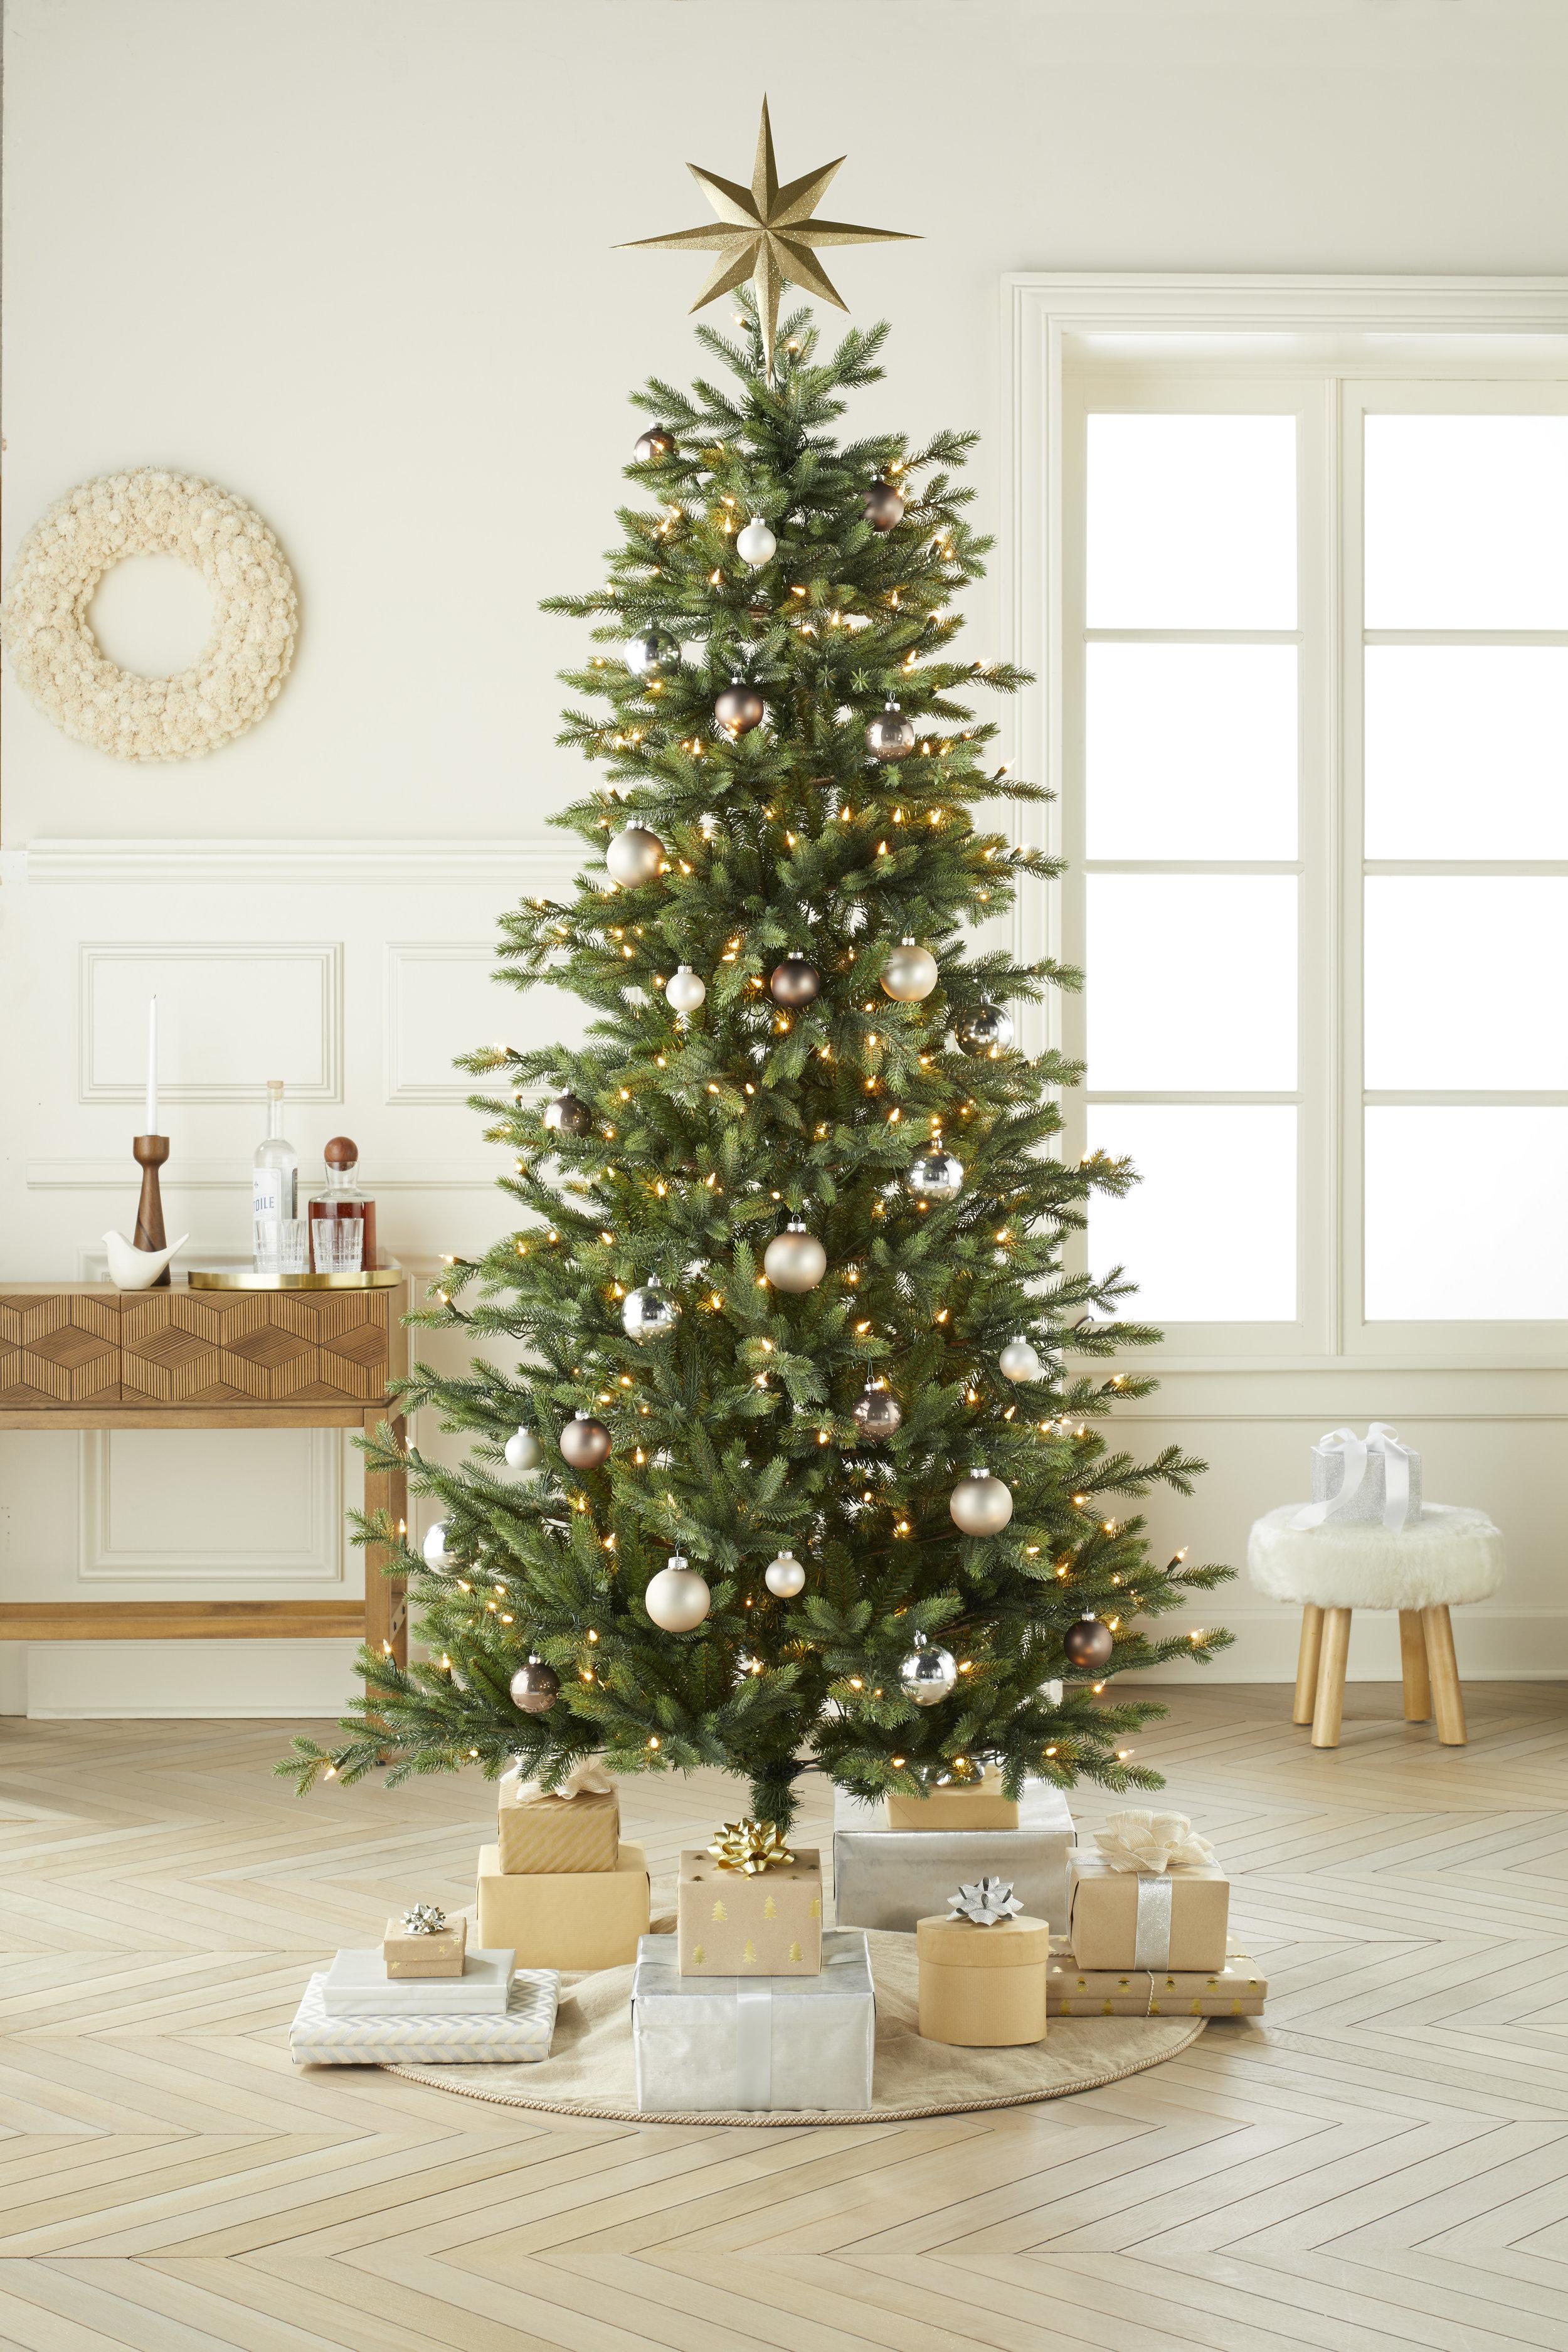 C-000696-01-043_051-01-2781_7' PRELIT Artificial Christmas Tree Balsam Fir - Wondershop.jpg